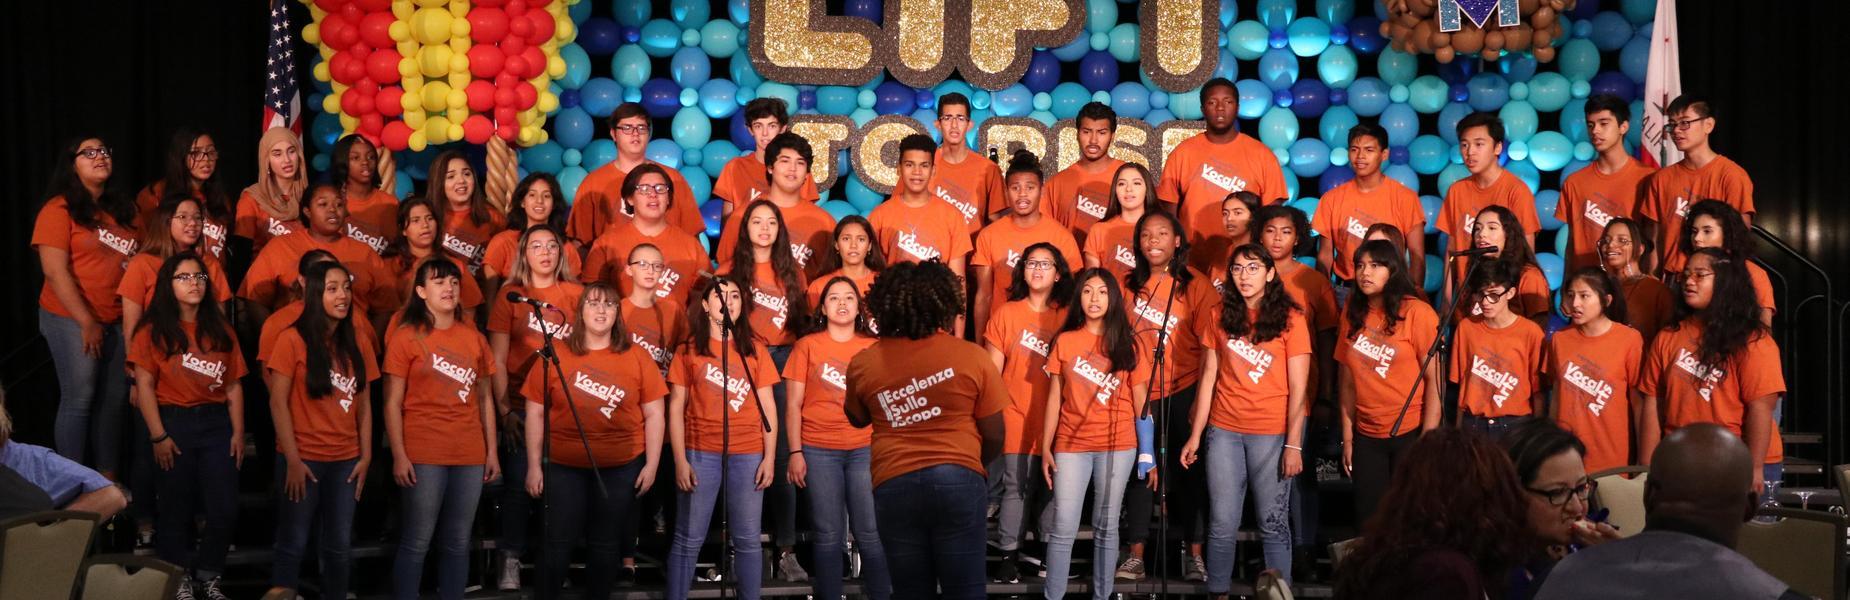 Vocal Arts Camp Performing at the 2019 Leadership Summit